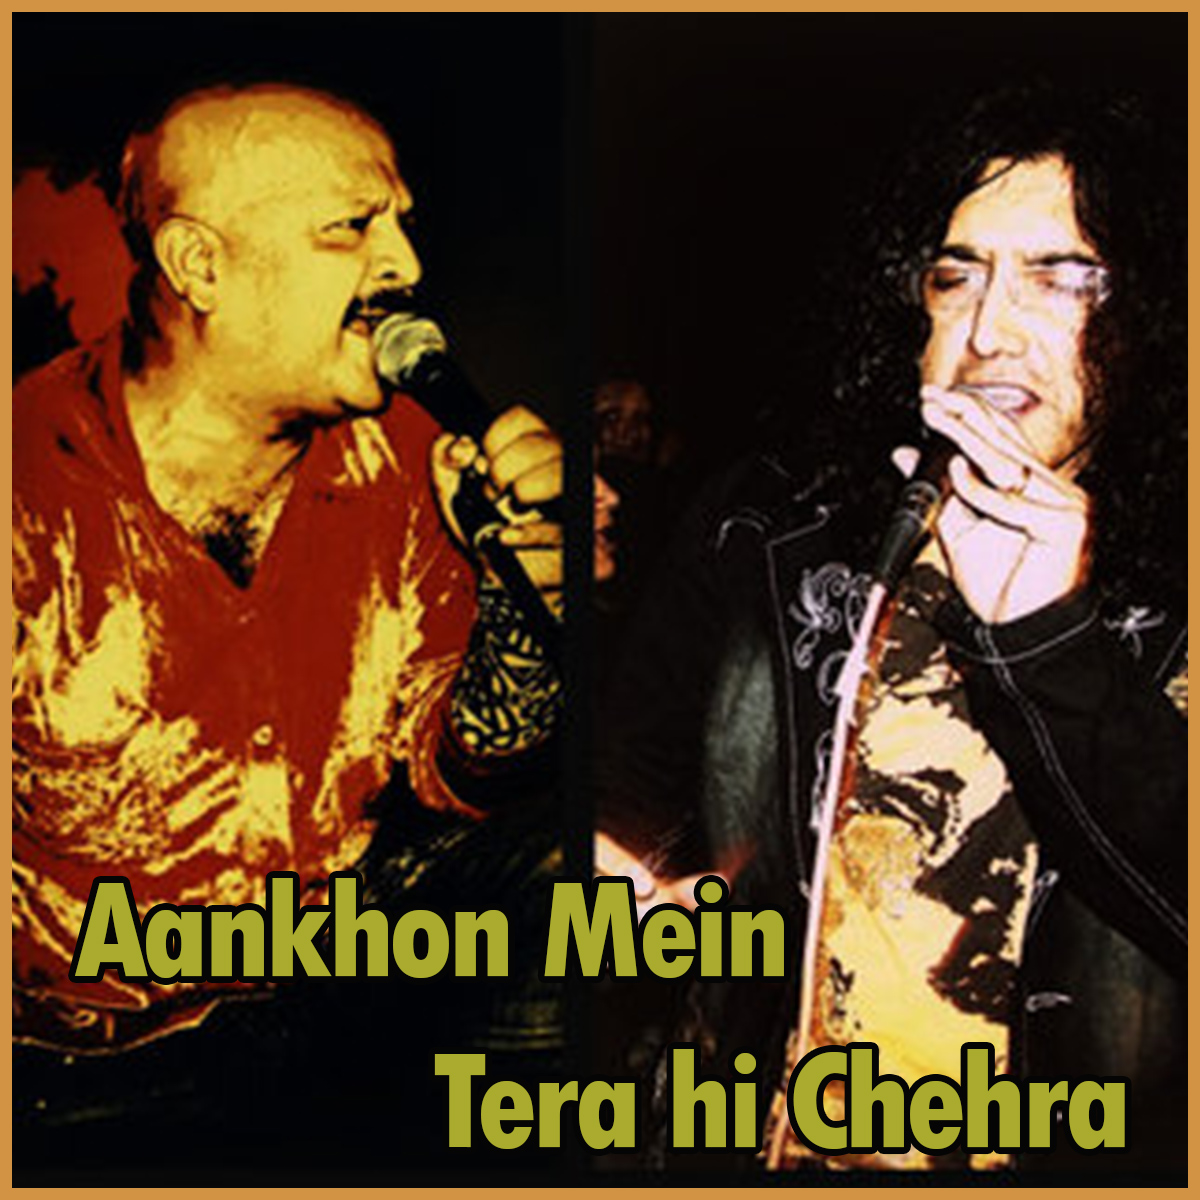 AANKHON MEIN TERA HI CHEHRA lyrics from Aankhon Mein Tera ...